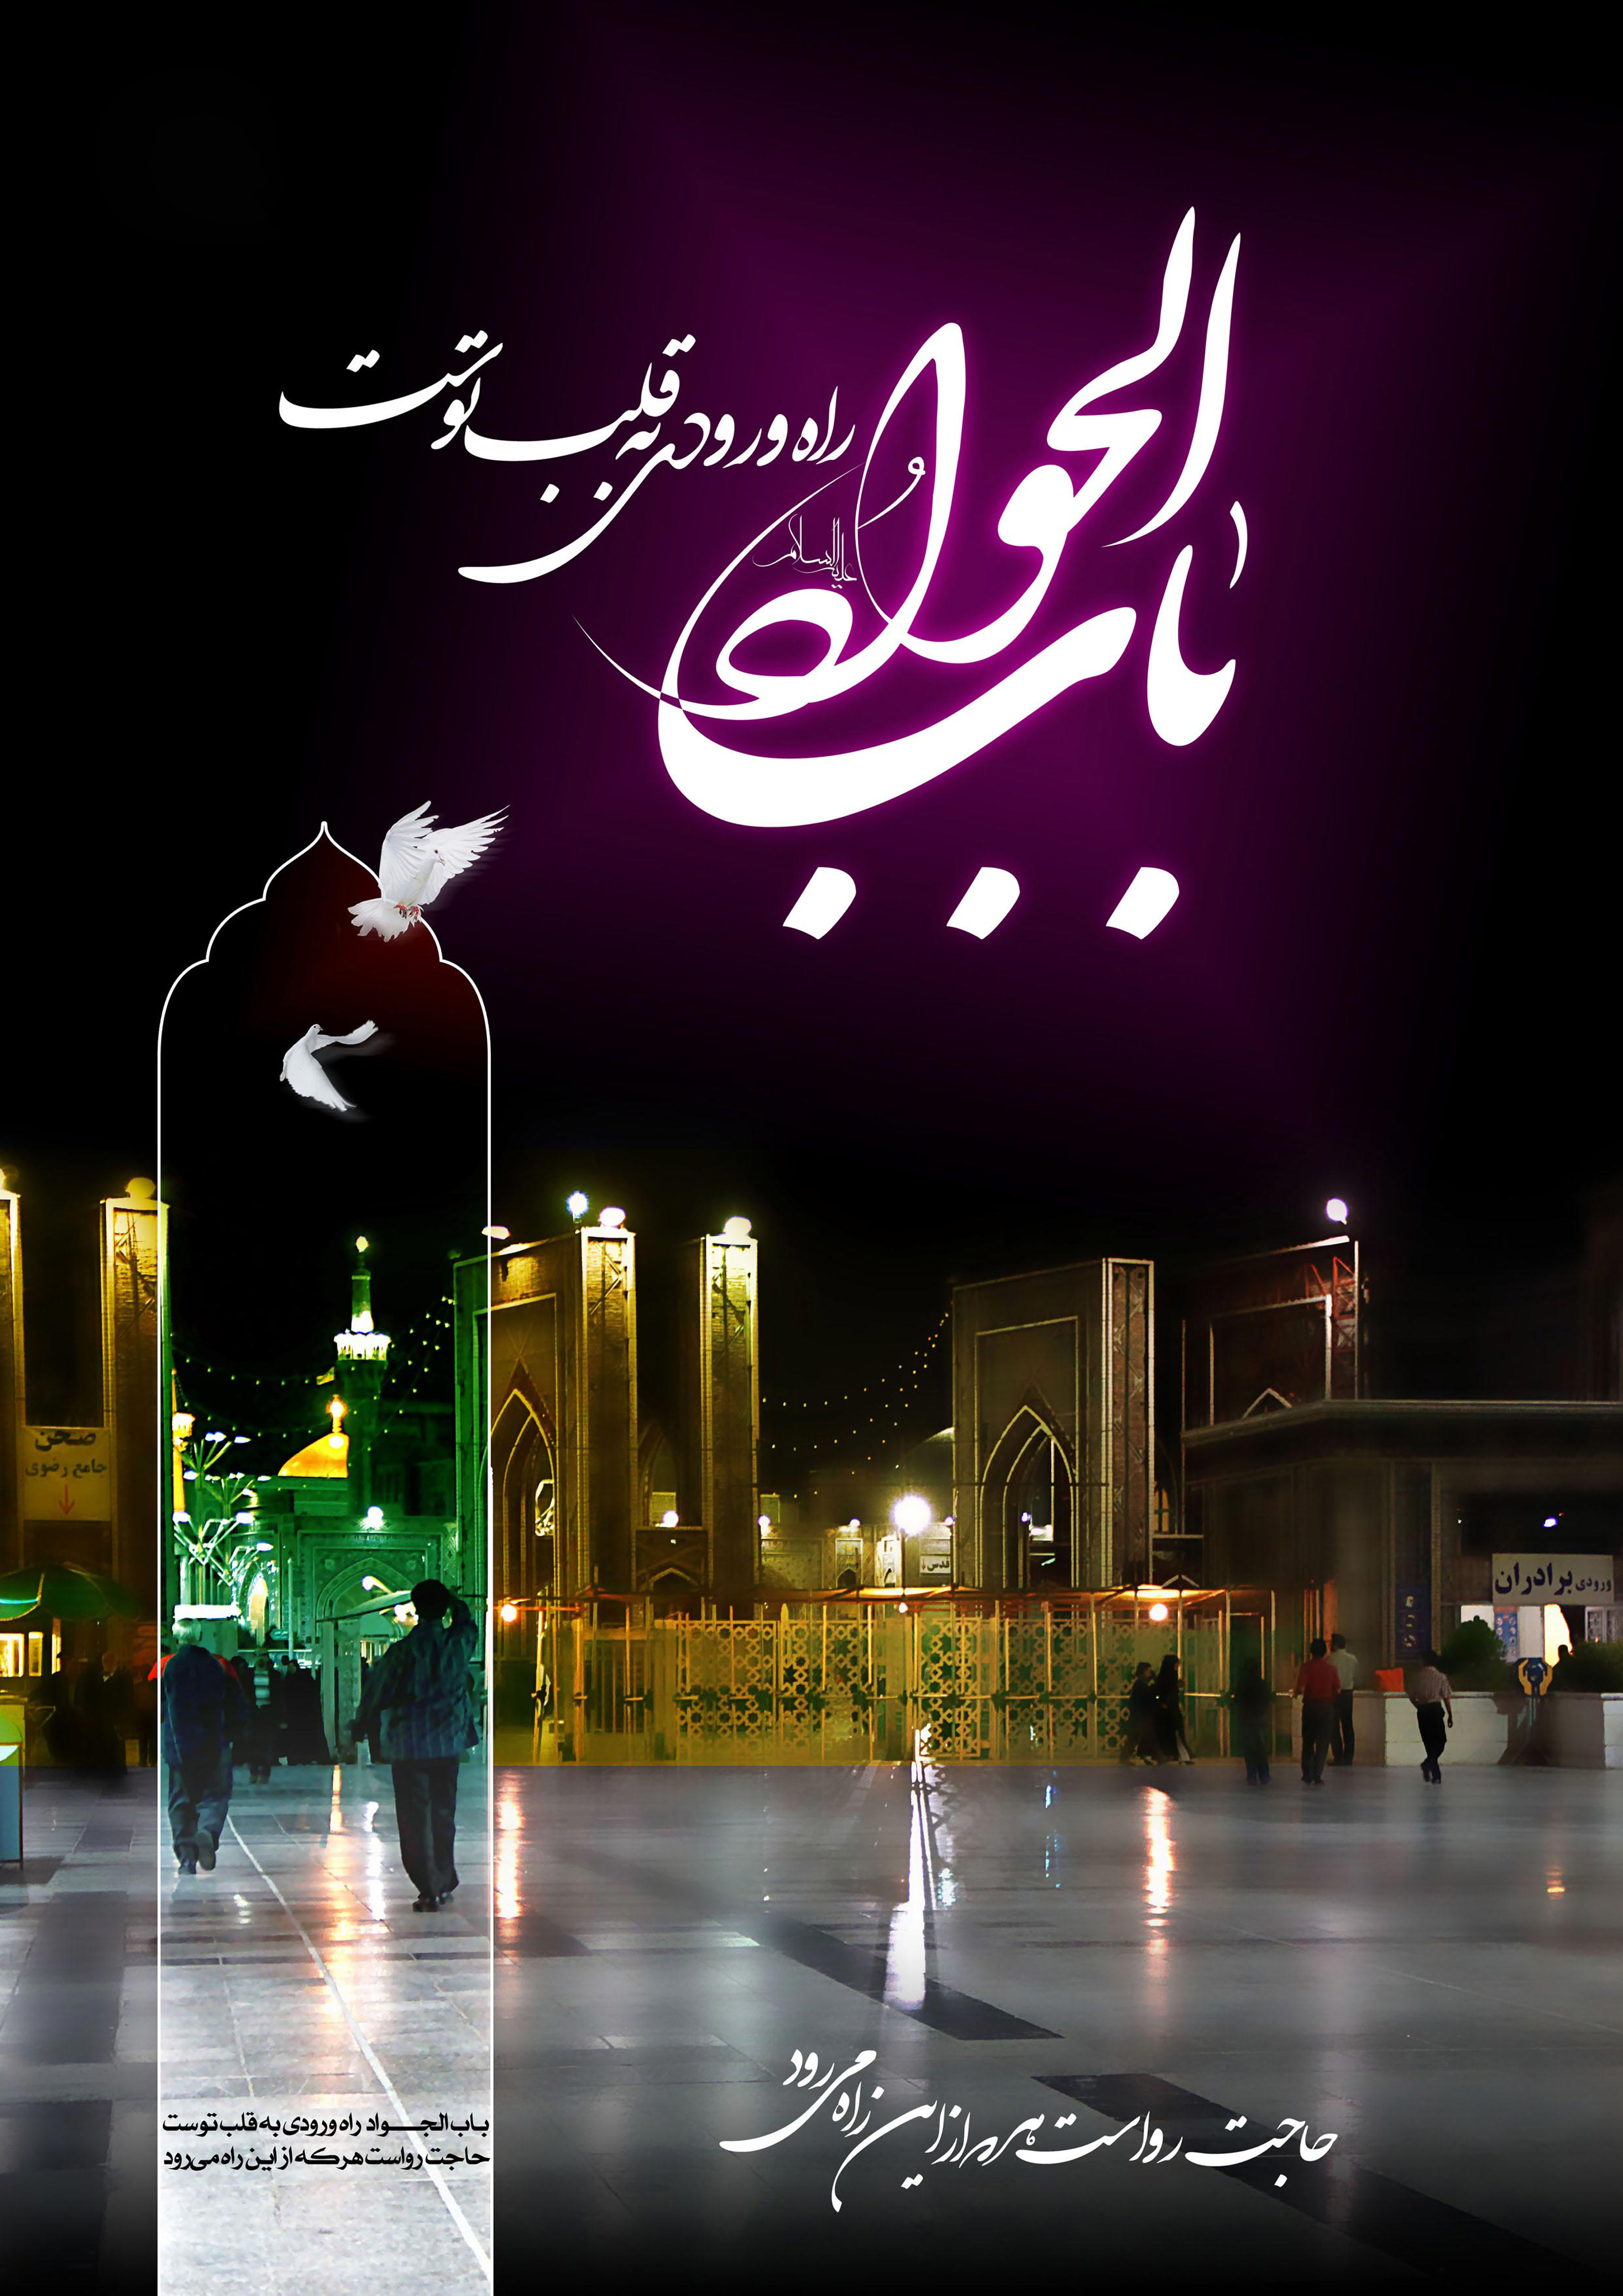 http://s2.picofile.com/file/7168362682/shahadat_emam_javad_2.jpg